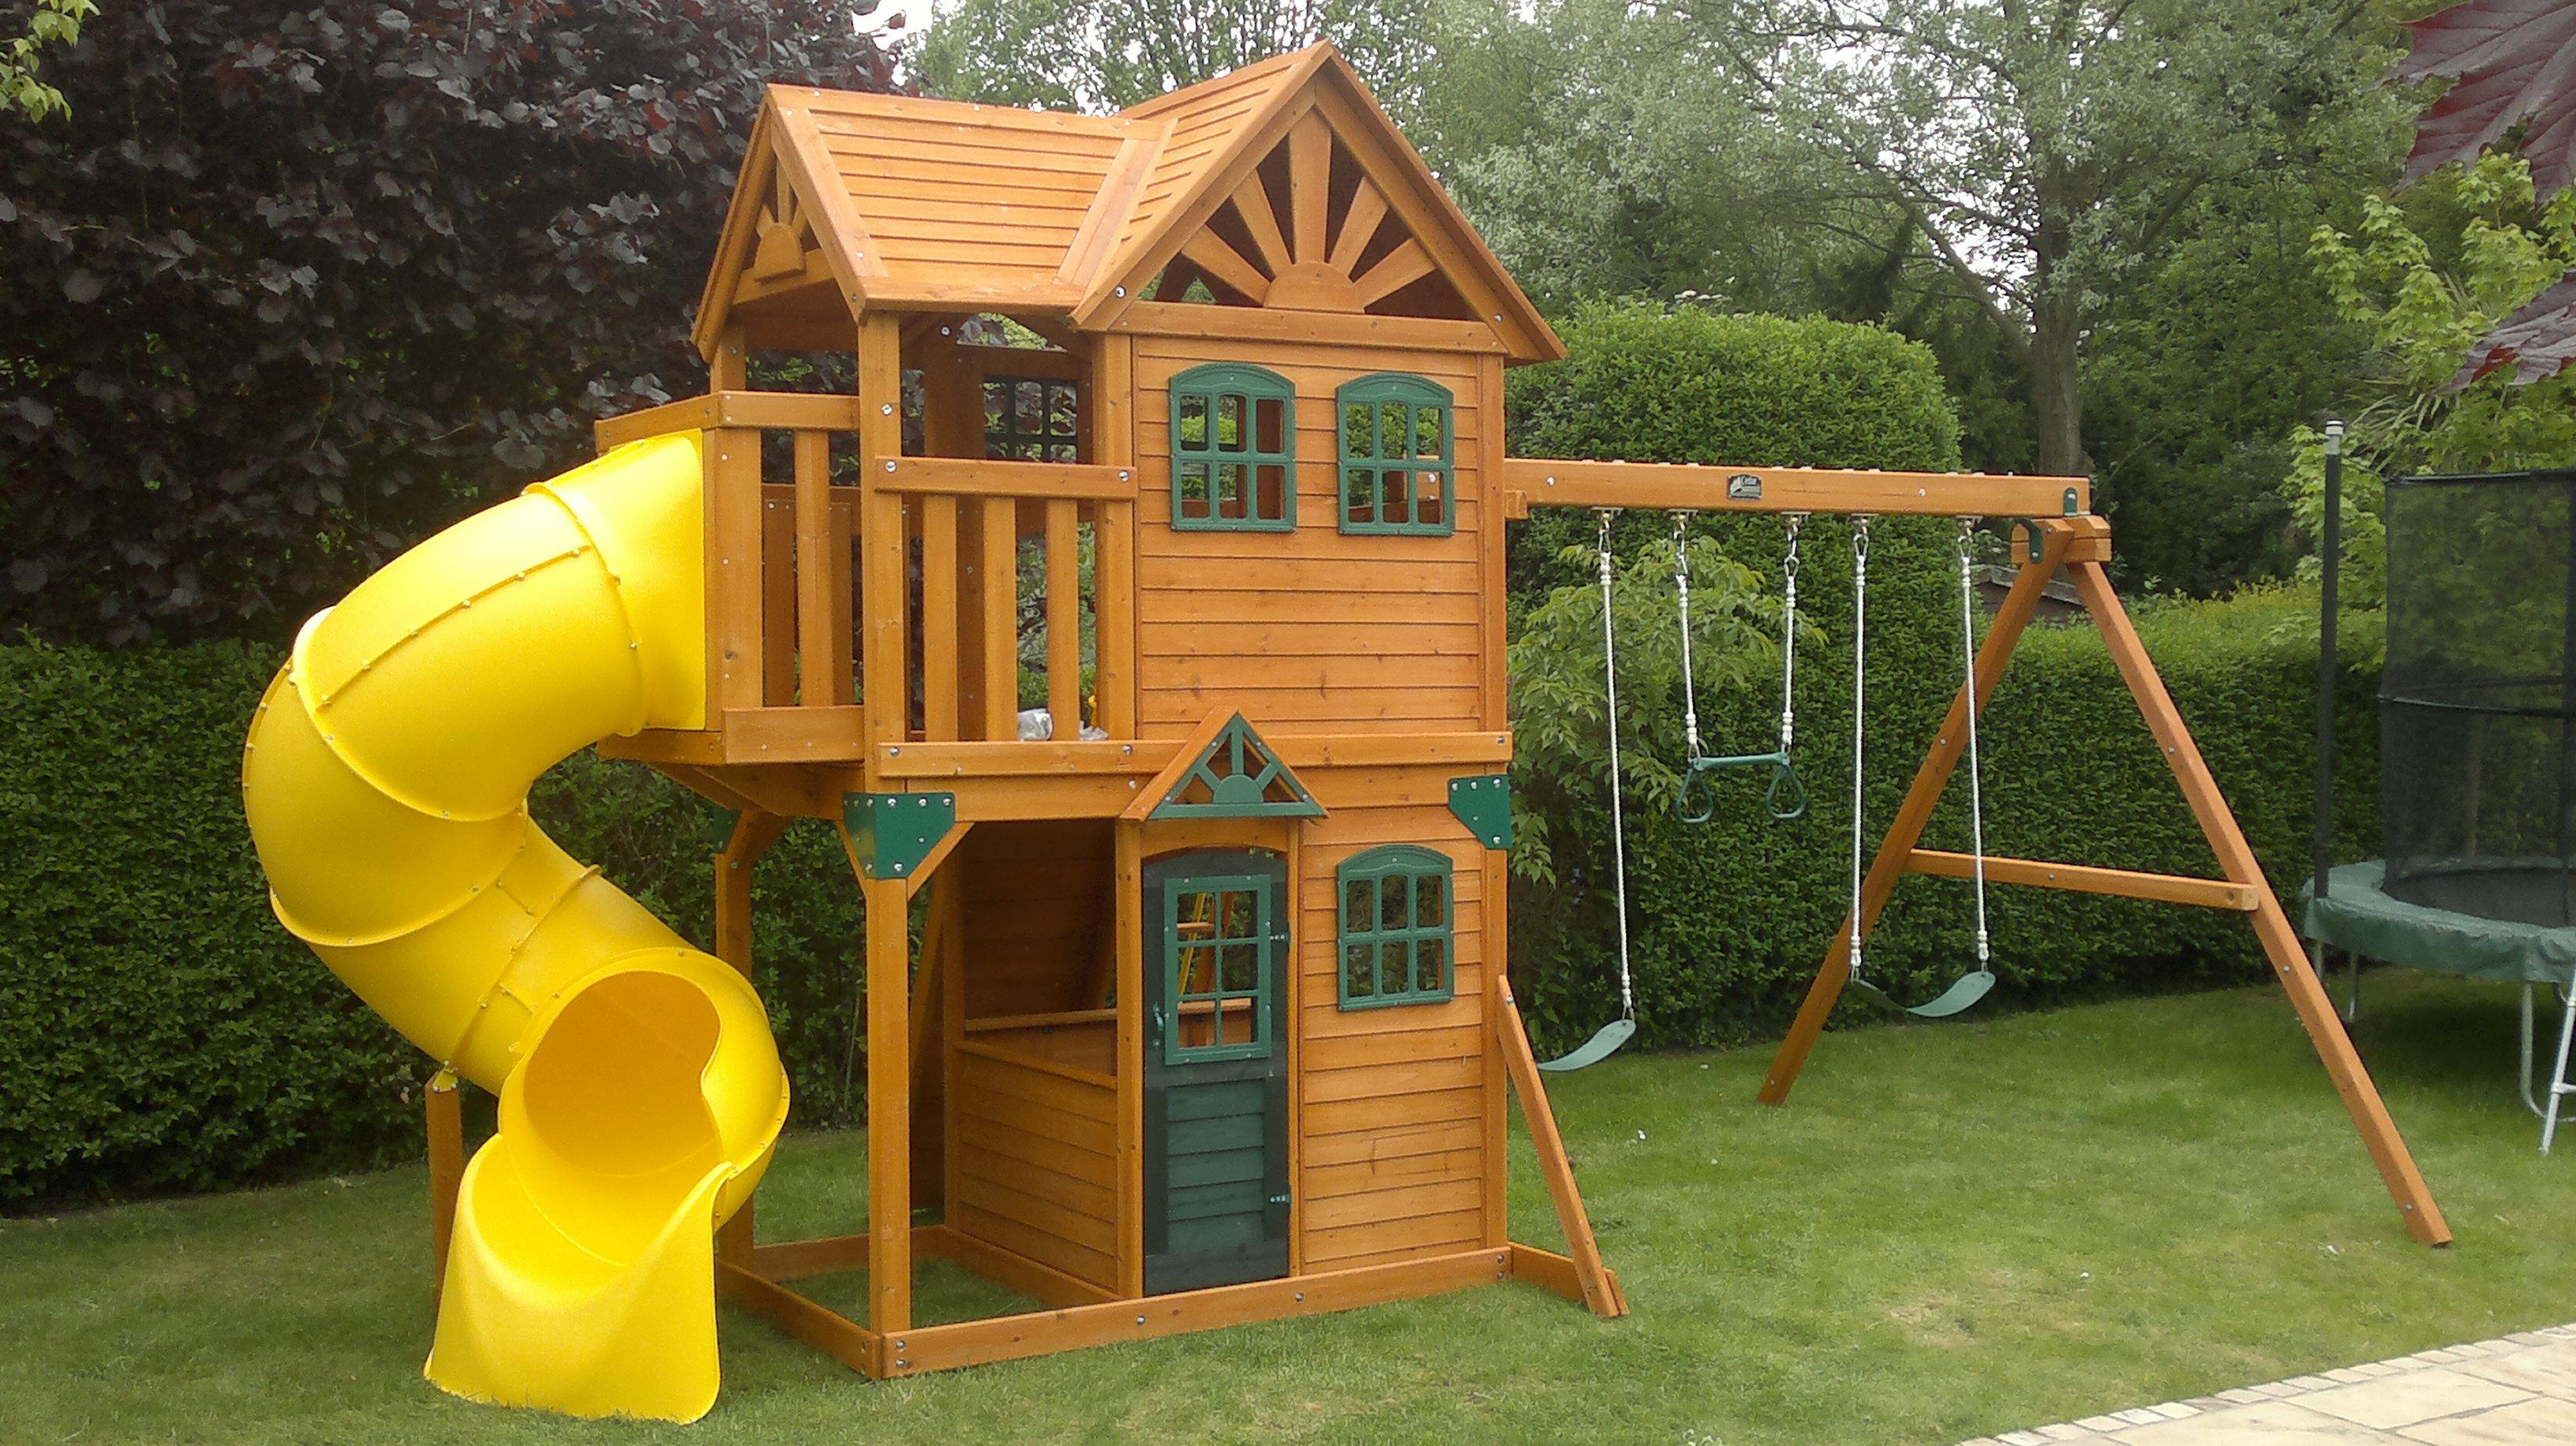 25.SIMPHOME.COM best outdoor playhouse outdoor ideas